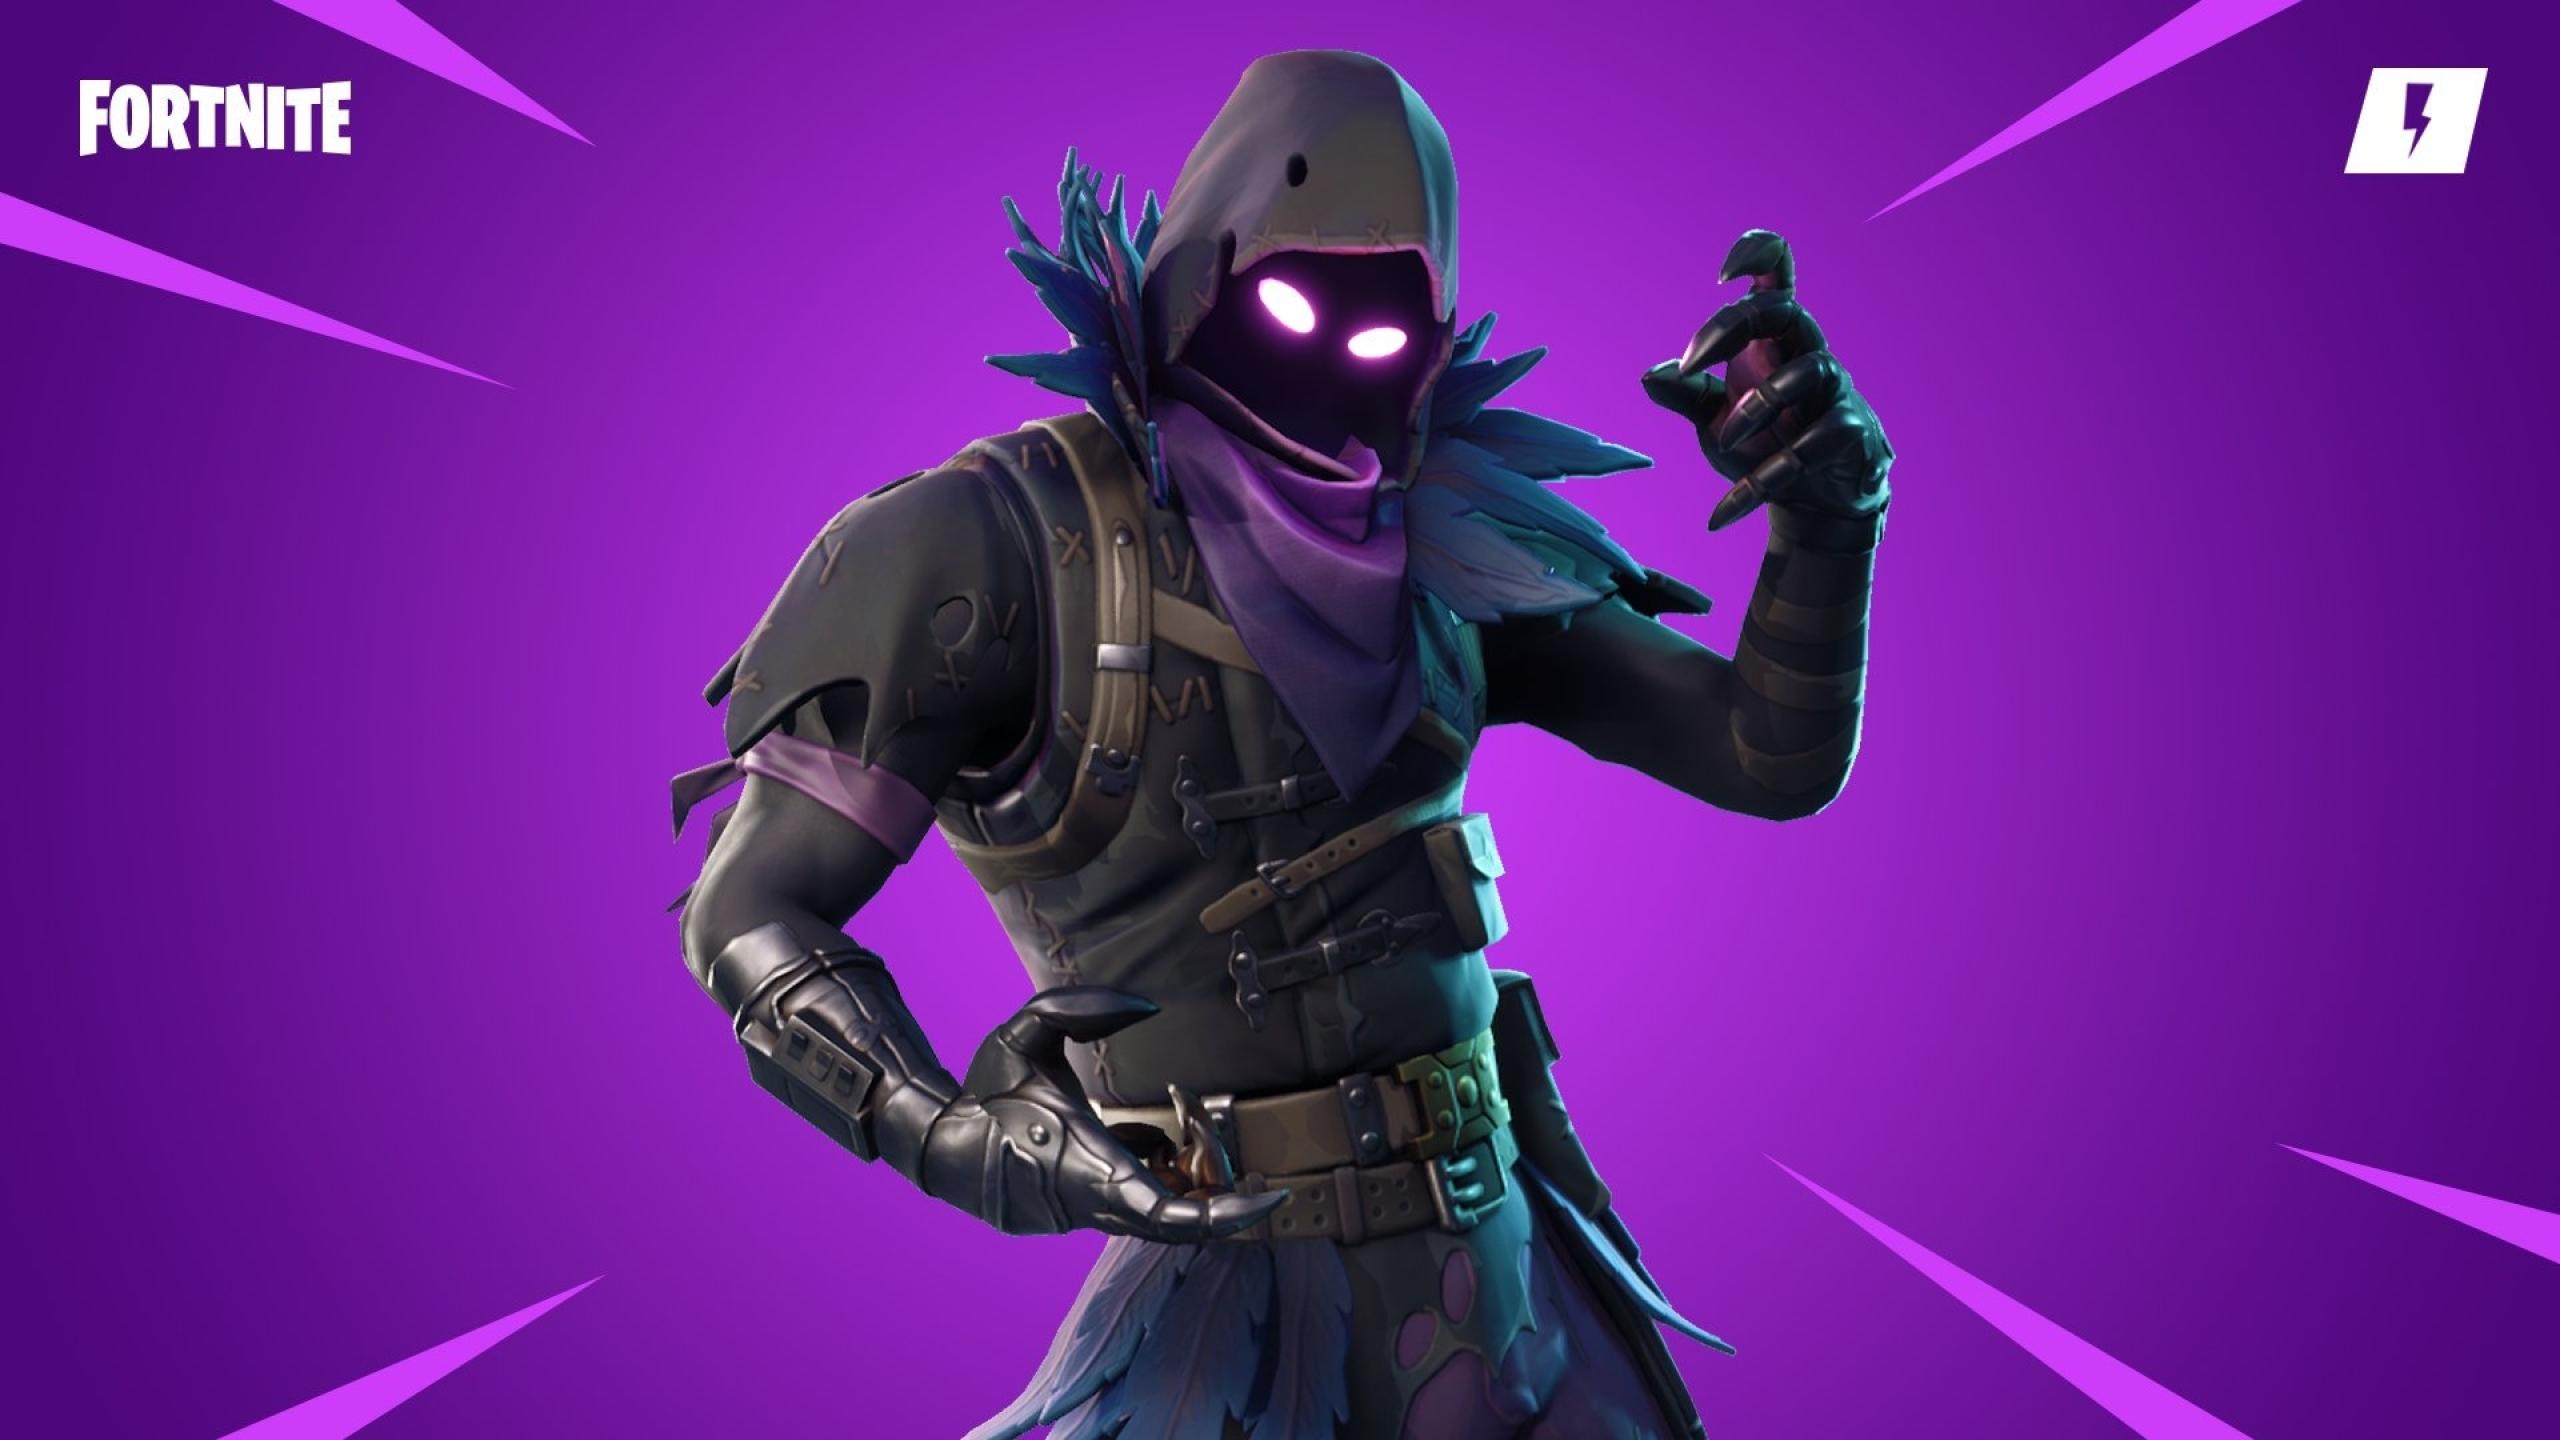 2560x1440 Raven Fortnite 1440p Resolution Wallpaper Hd